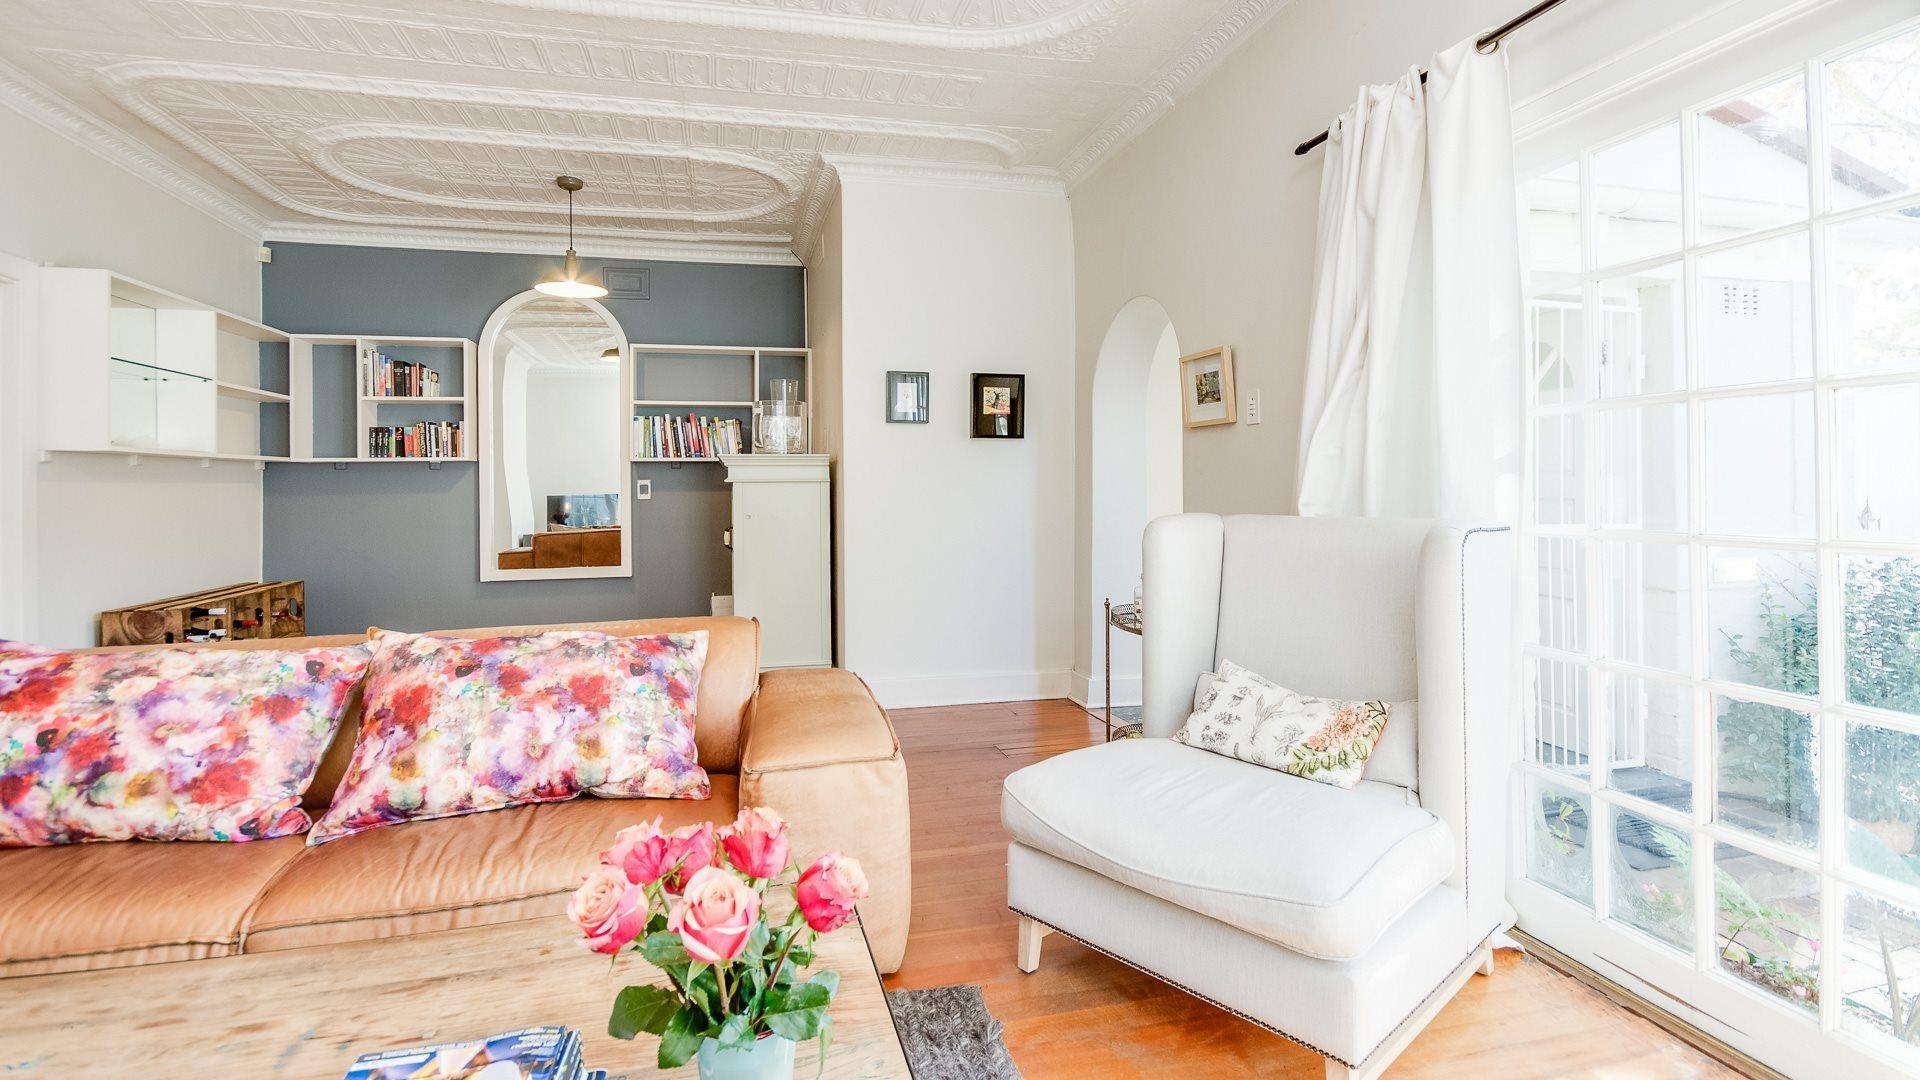 Johannesburg, Parkhurst Property  | Houses For Sale Parkhurst, Parkhurst, House 3 bedrooms property for sale Price:2,590,000